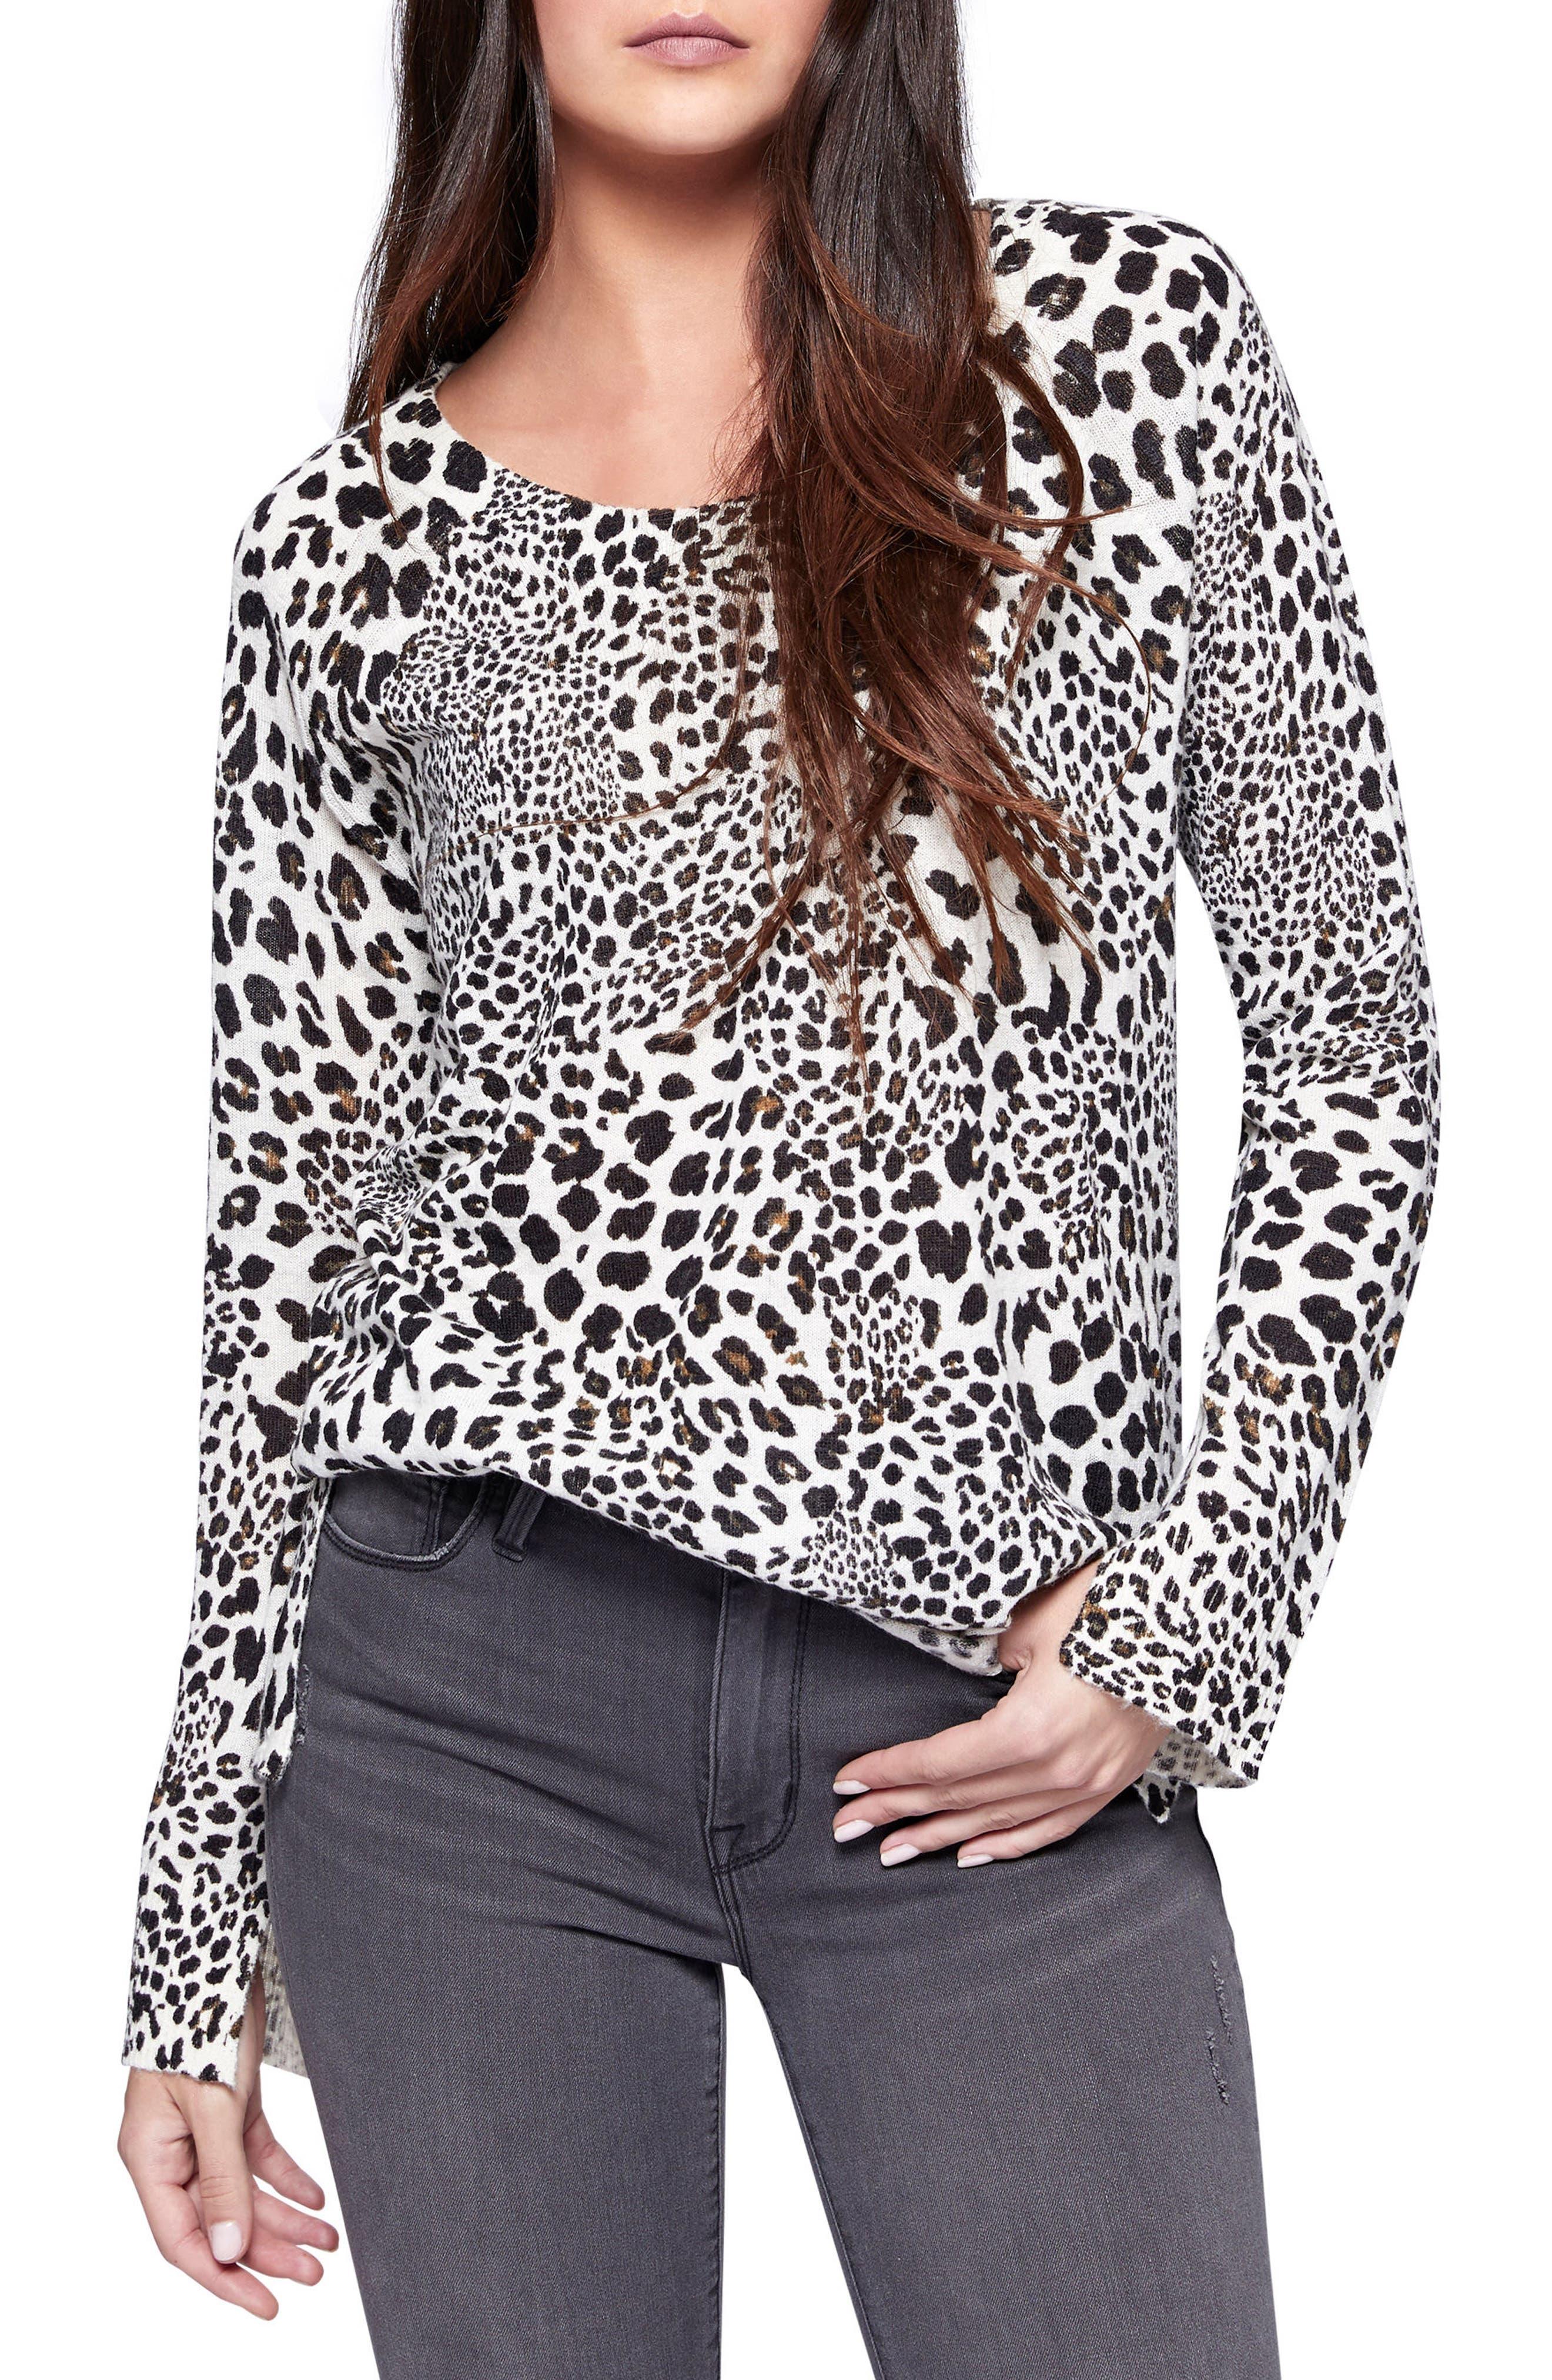 Cabaret Crew Animal Print Sweater,                         Main,                         color, Cabernet Leopard